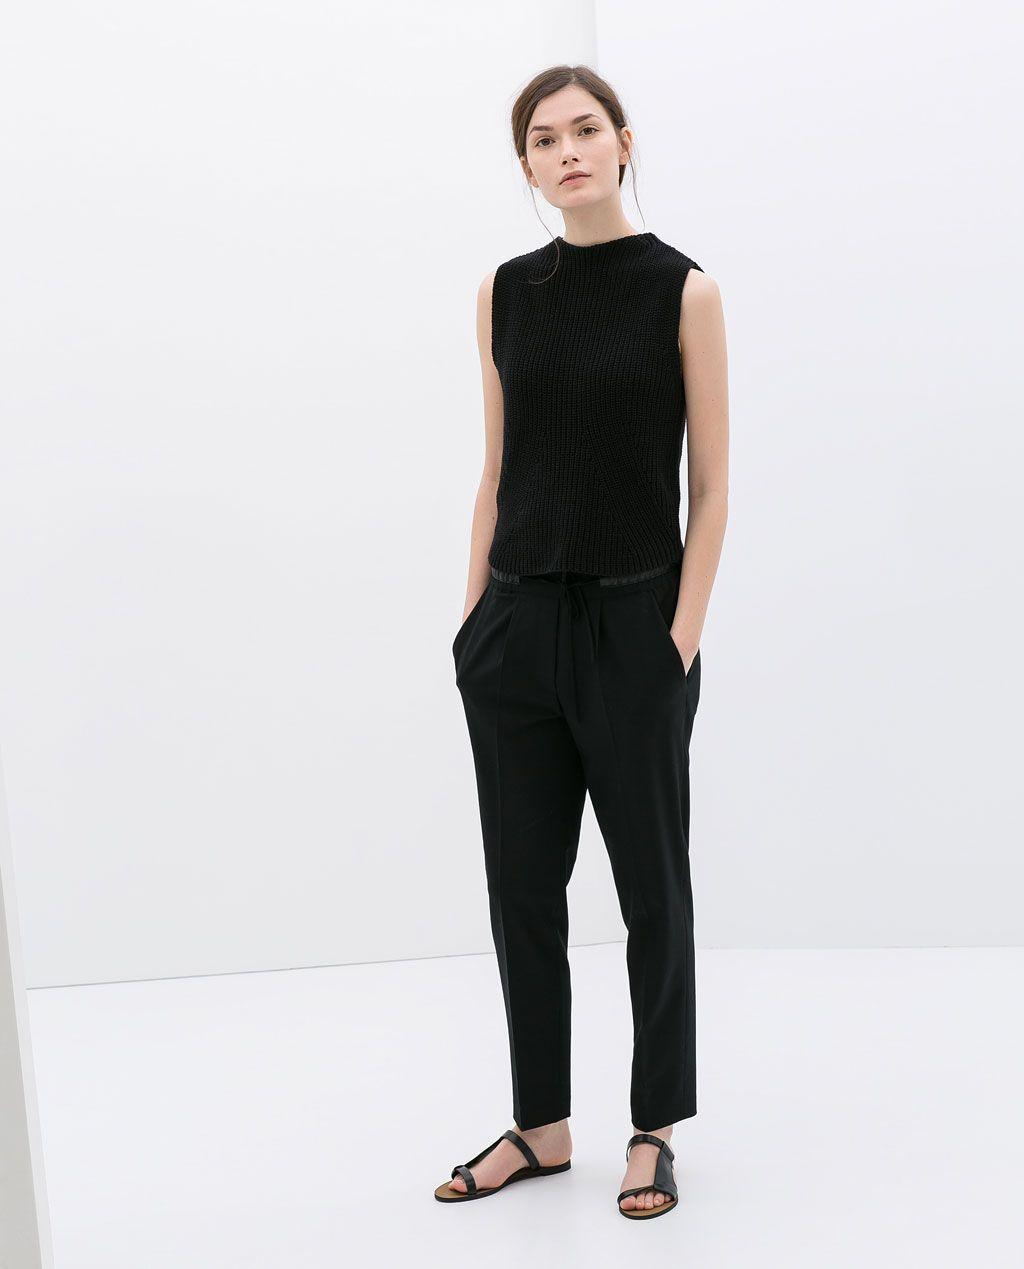 Zara hose schwarz